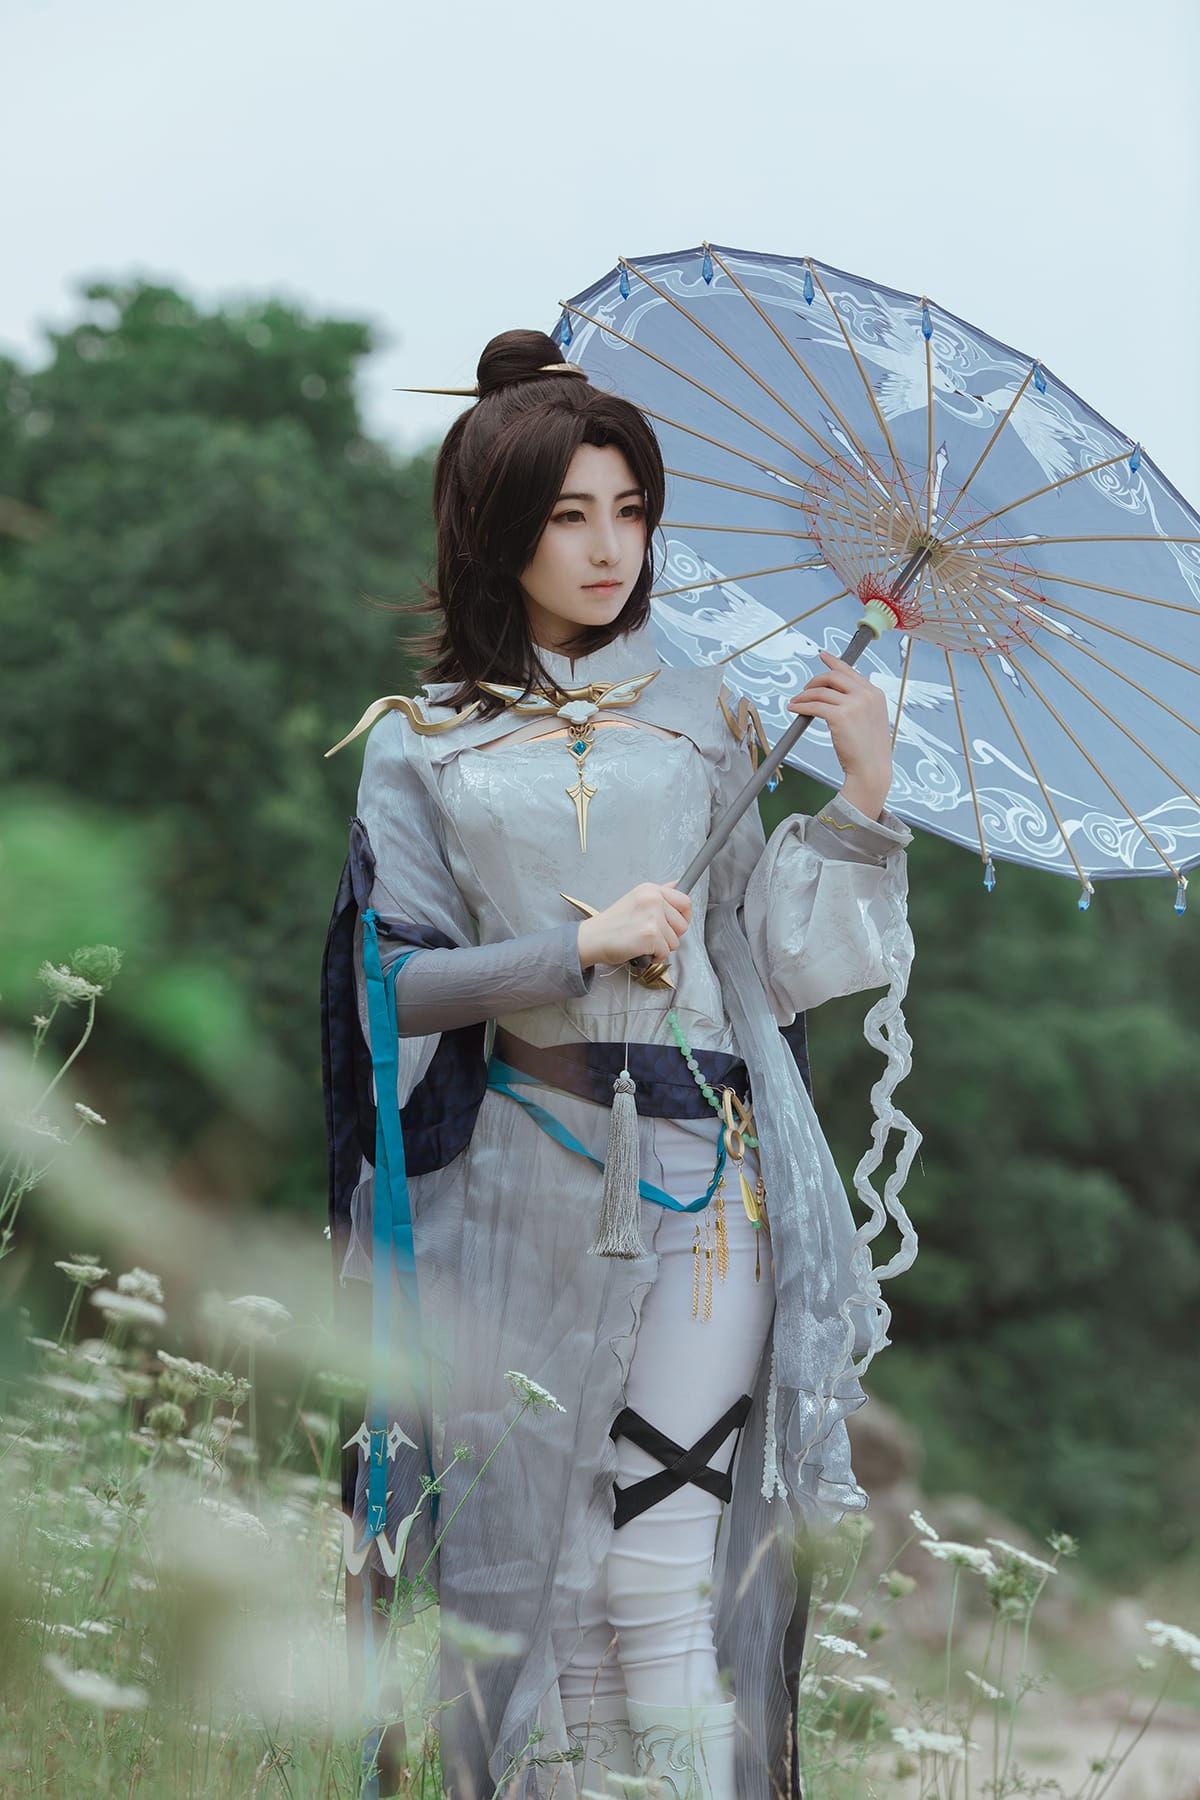 剑网三蓬莱cosplay